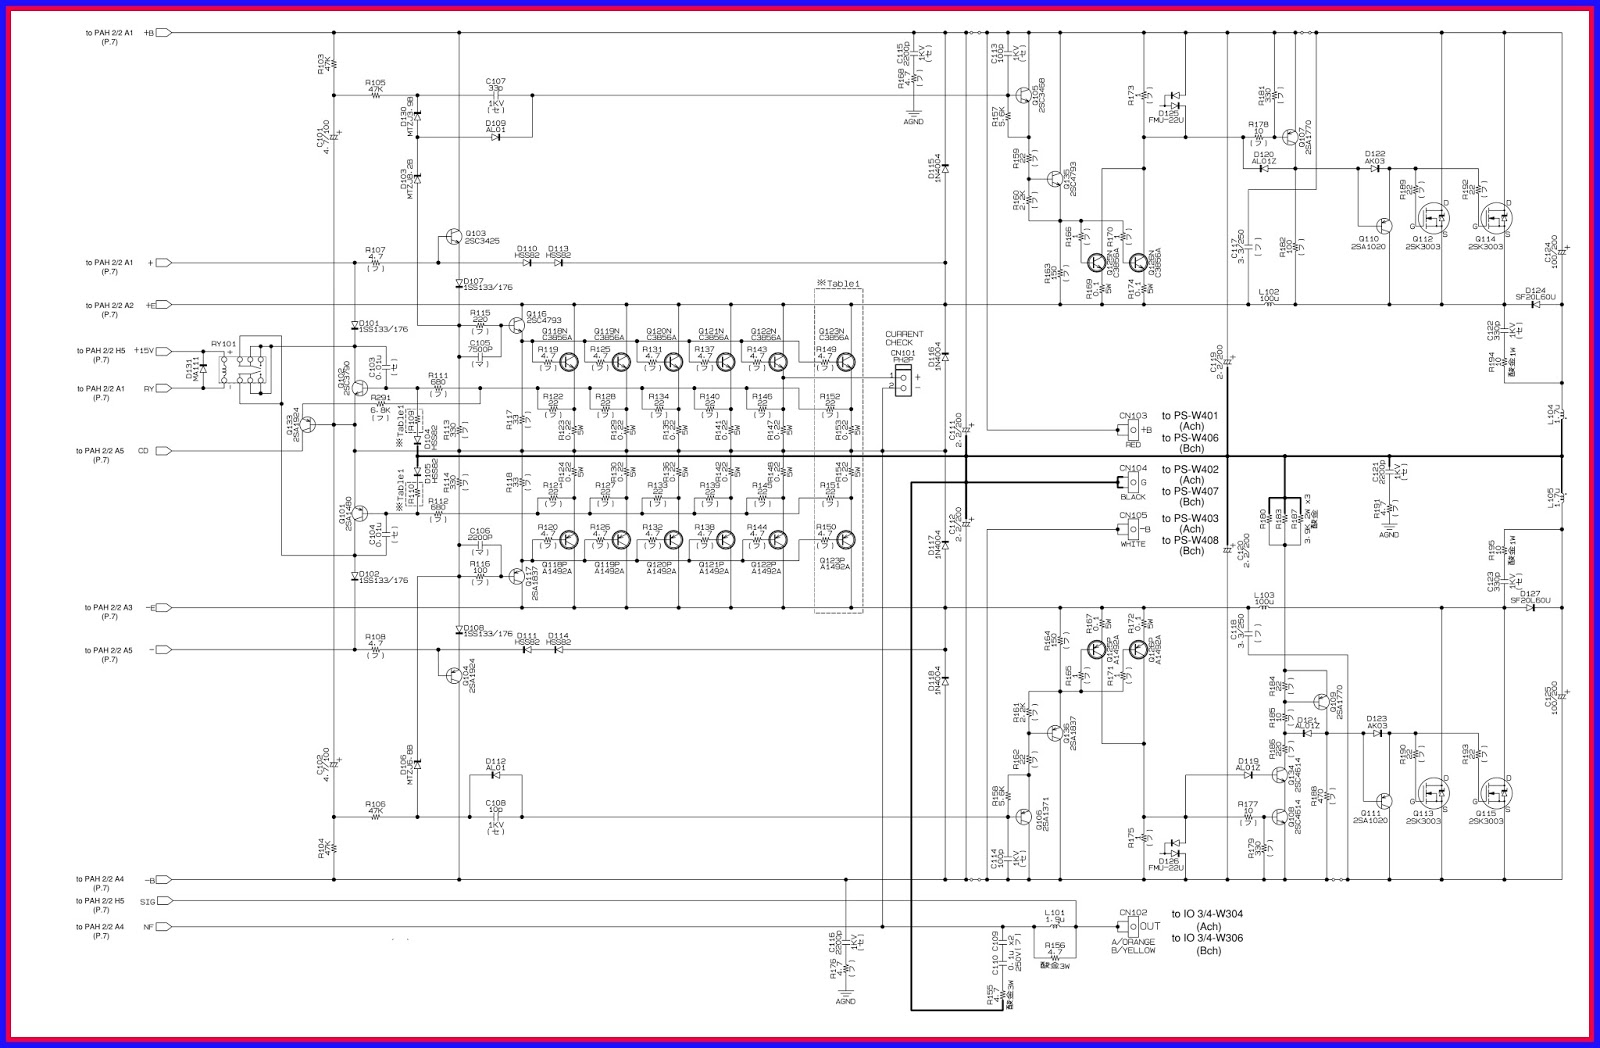 medium resolution of yamaha amp schematic wiring diagram megayamaha amp schematic wiring diagram yamaha amp schematics yamaha amp schematic